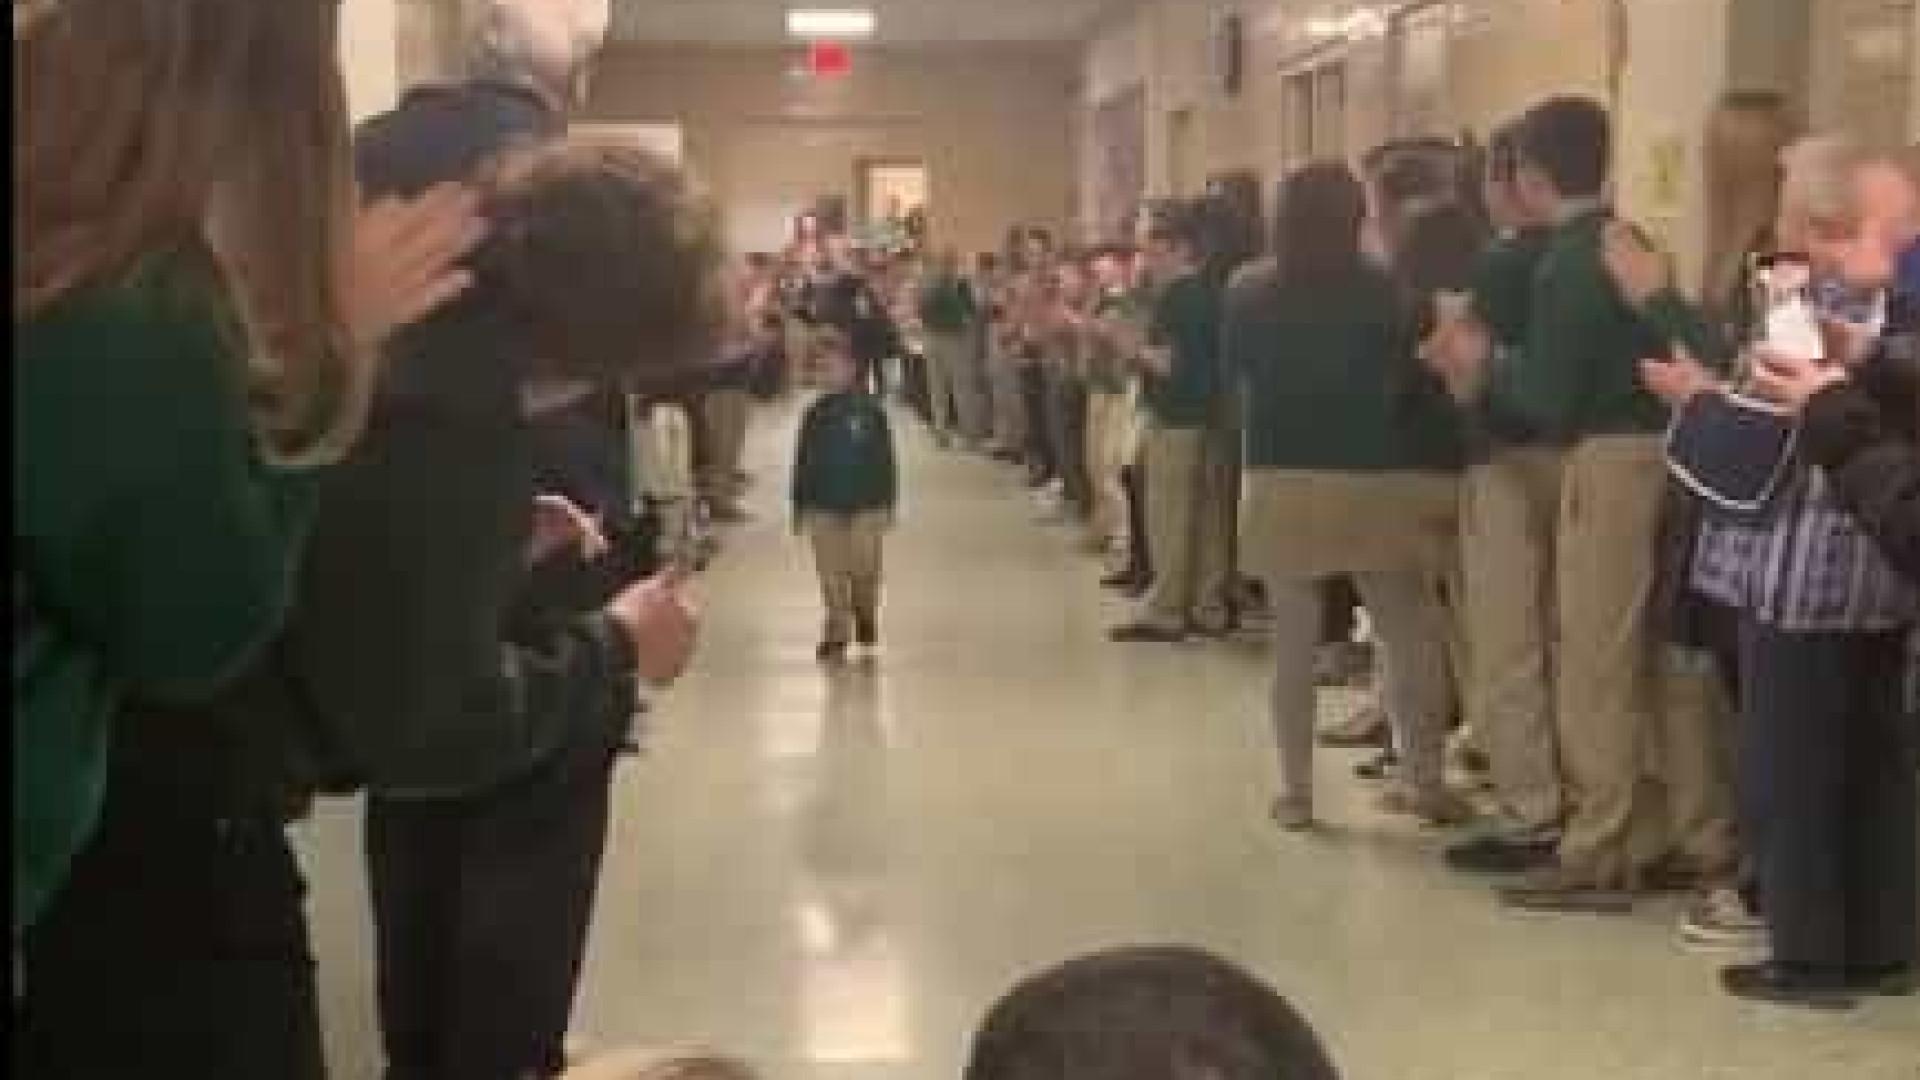 Menino recebido na escola com aplausos após terminar quimioterapia